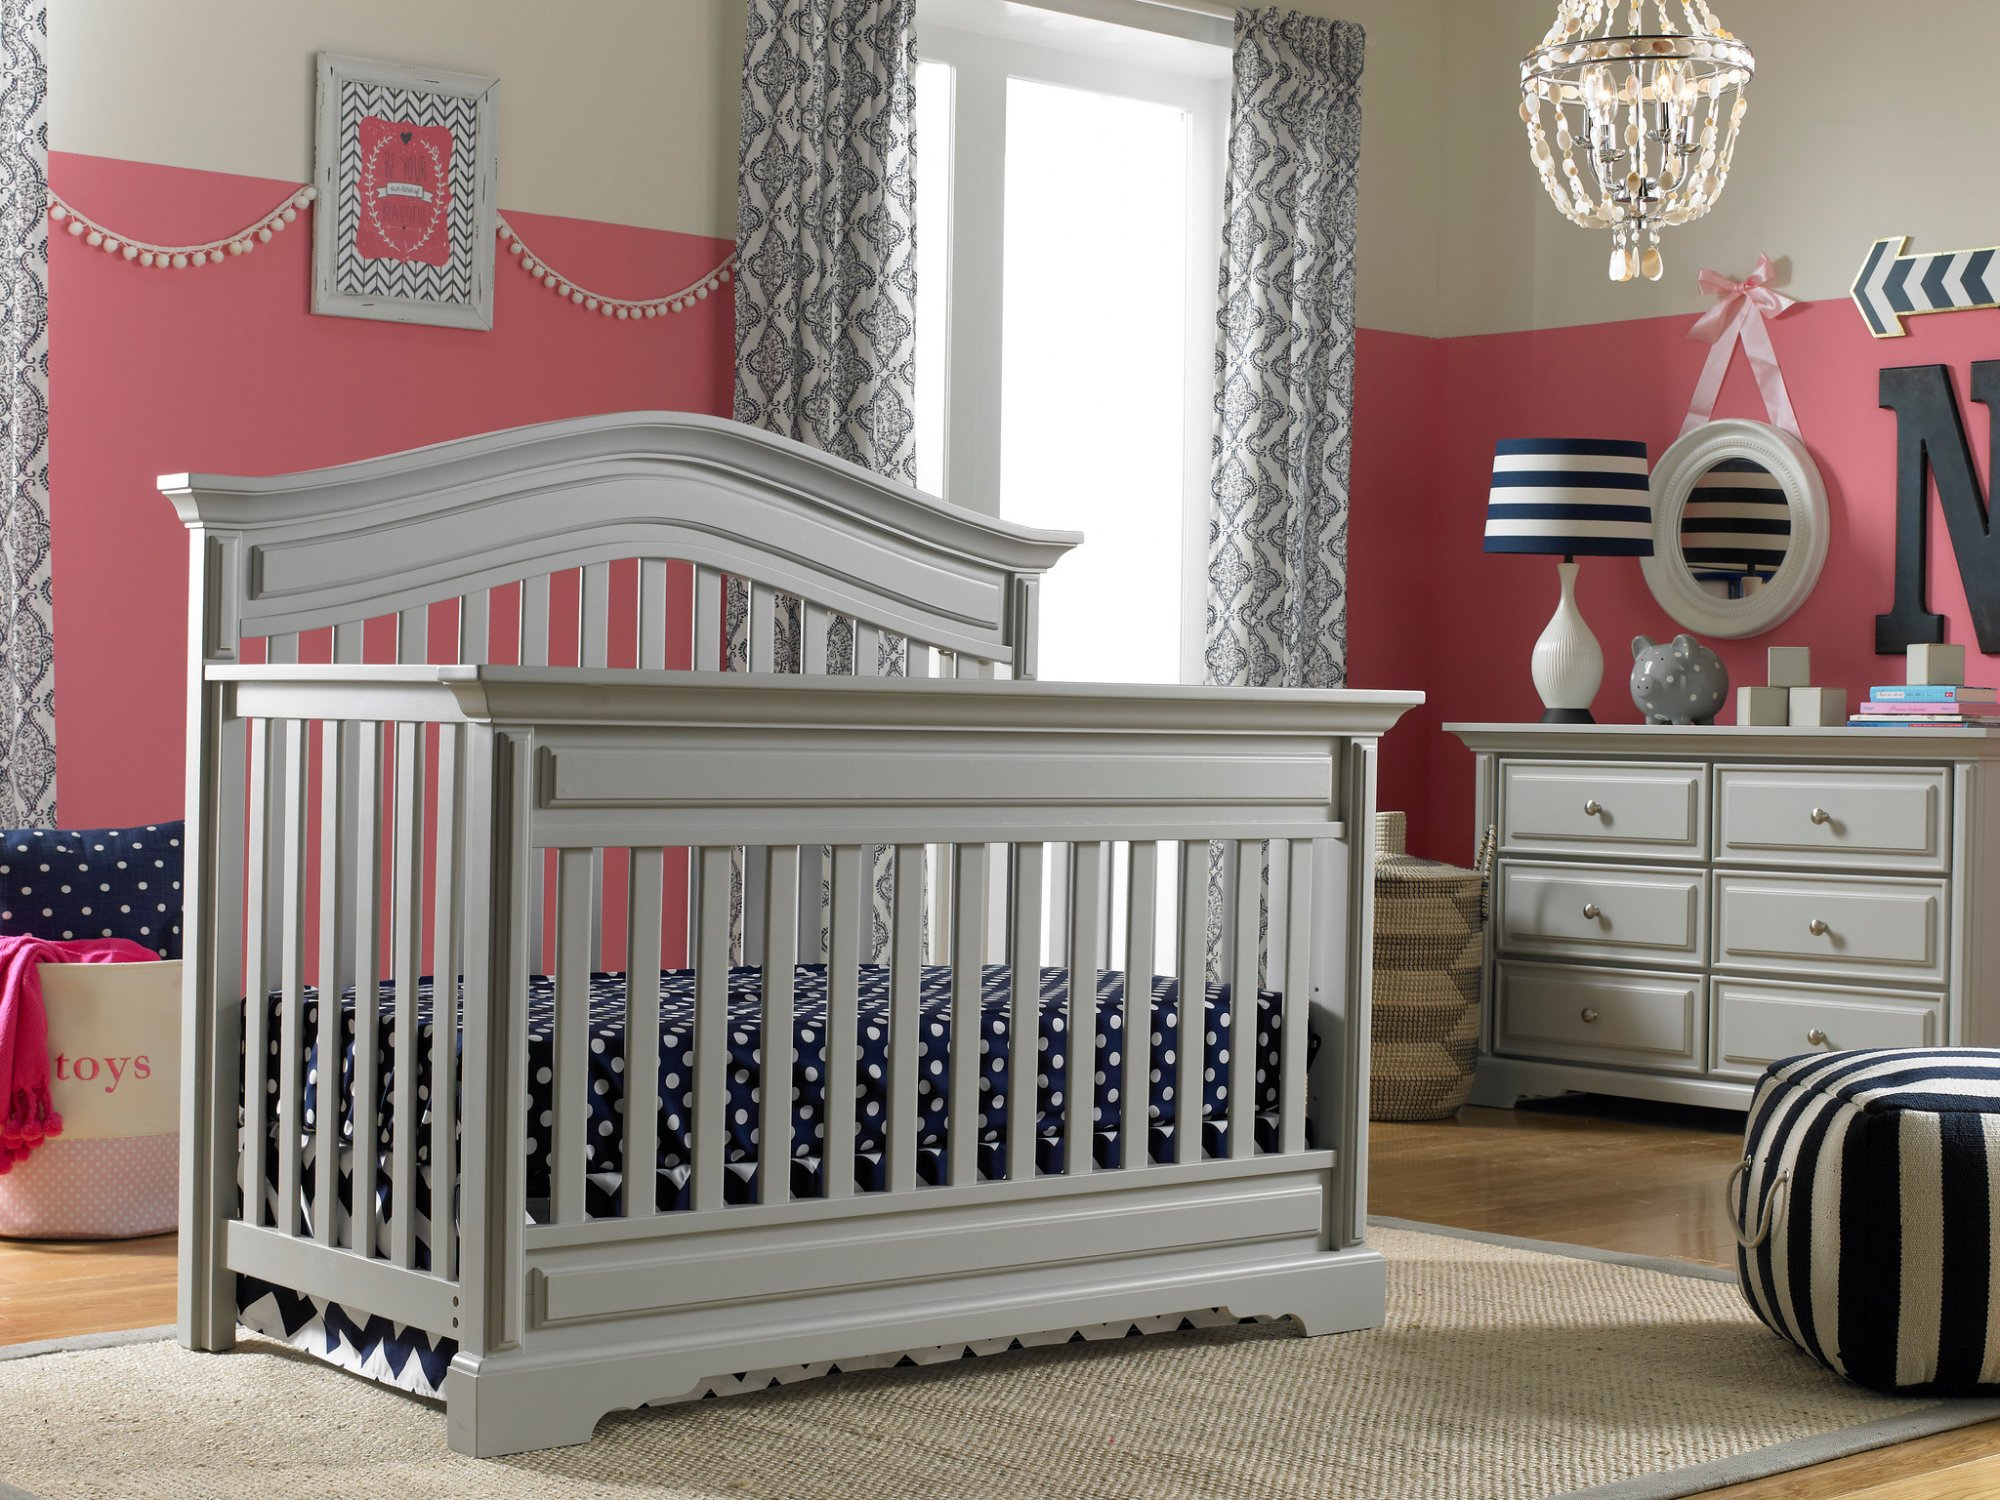 Dolce | Venezia | Convertible Crib